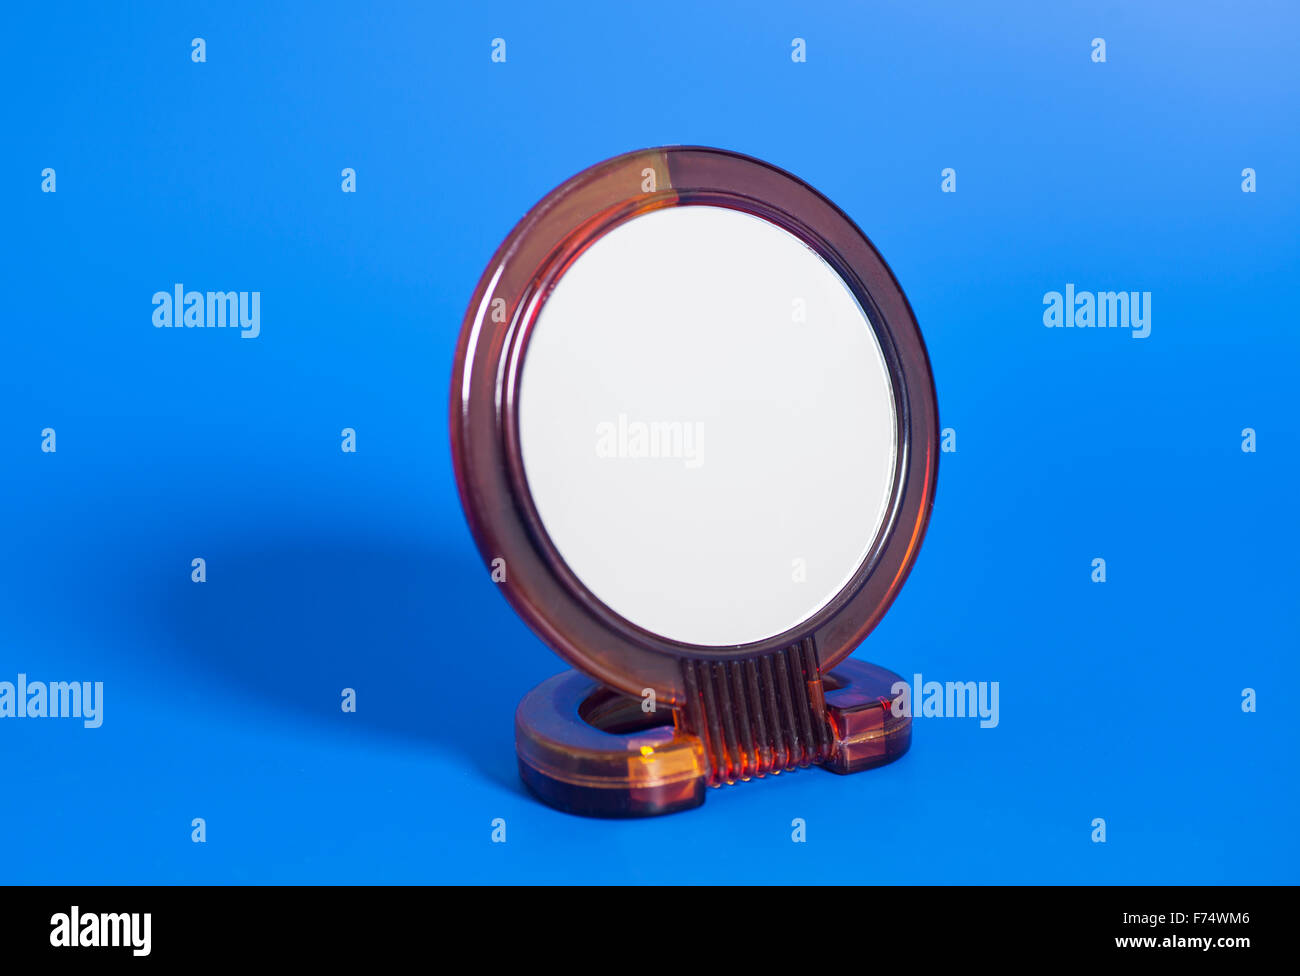 Make Up Spiegels : Makeup mirror stockfotos makeup mirror bilder alamy